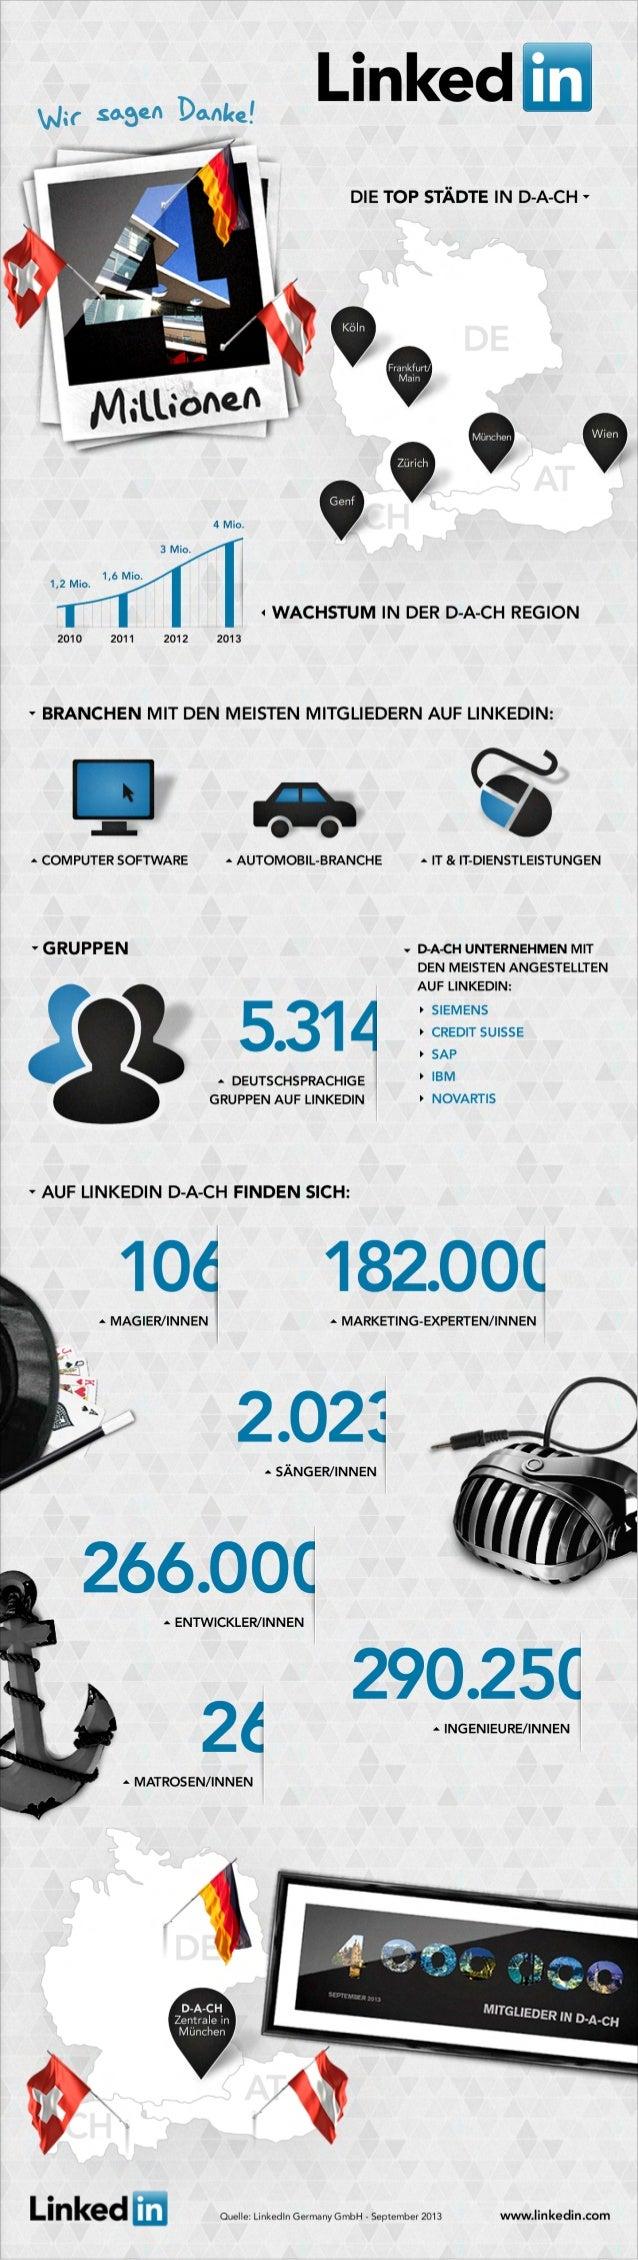 MARKETING-EXPERTEN/INNEN 182.000 INGENIEURE/INNEN 290.250 MATROSEN/INNEN 26 MAGIER/INNEN SIEMENS CREDIT SUISSE SAP IBM 106...